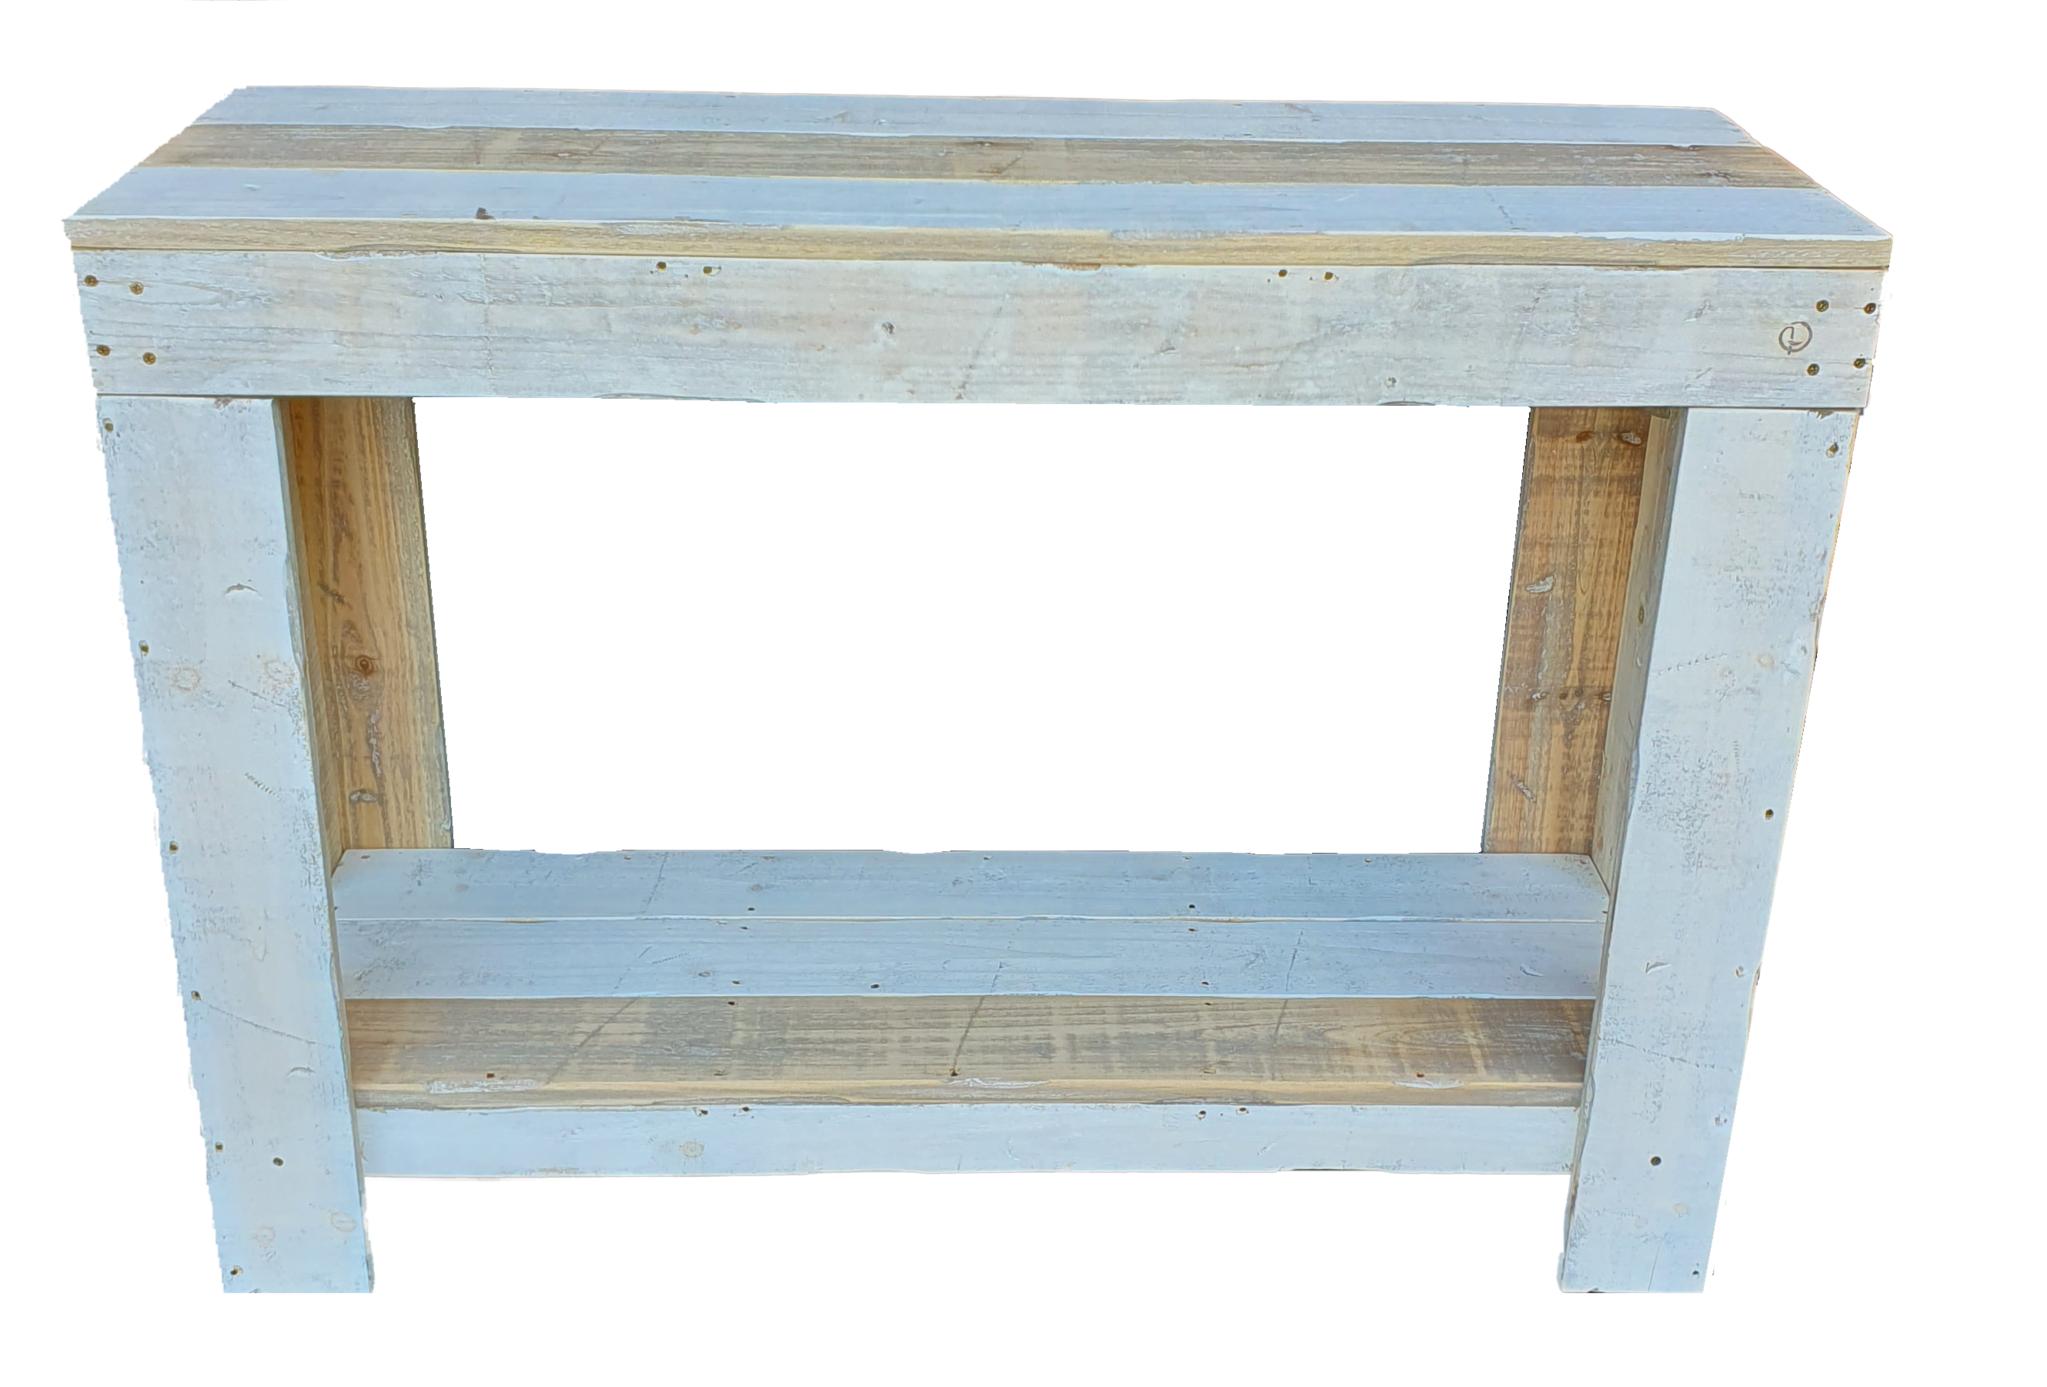 shop int ibiza white table double 110/39-1